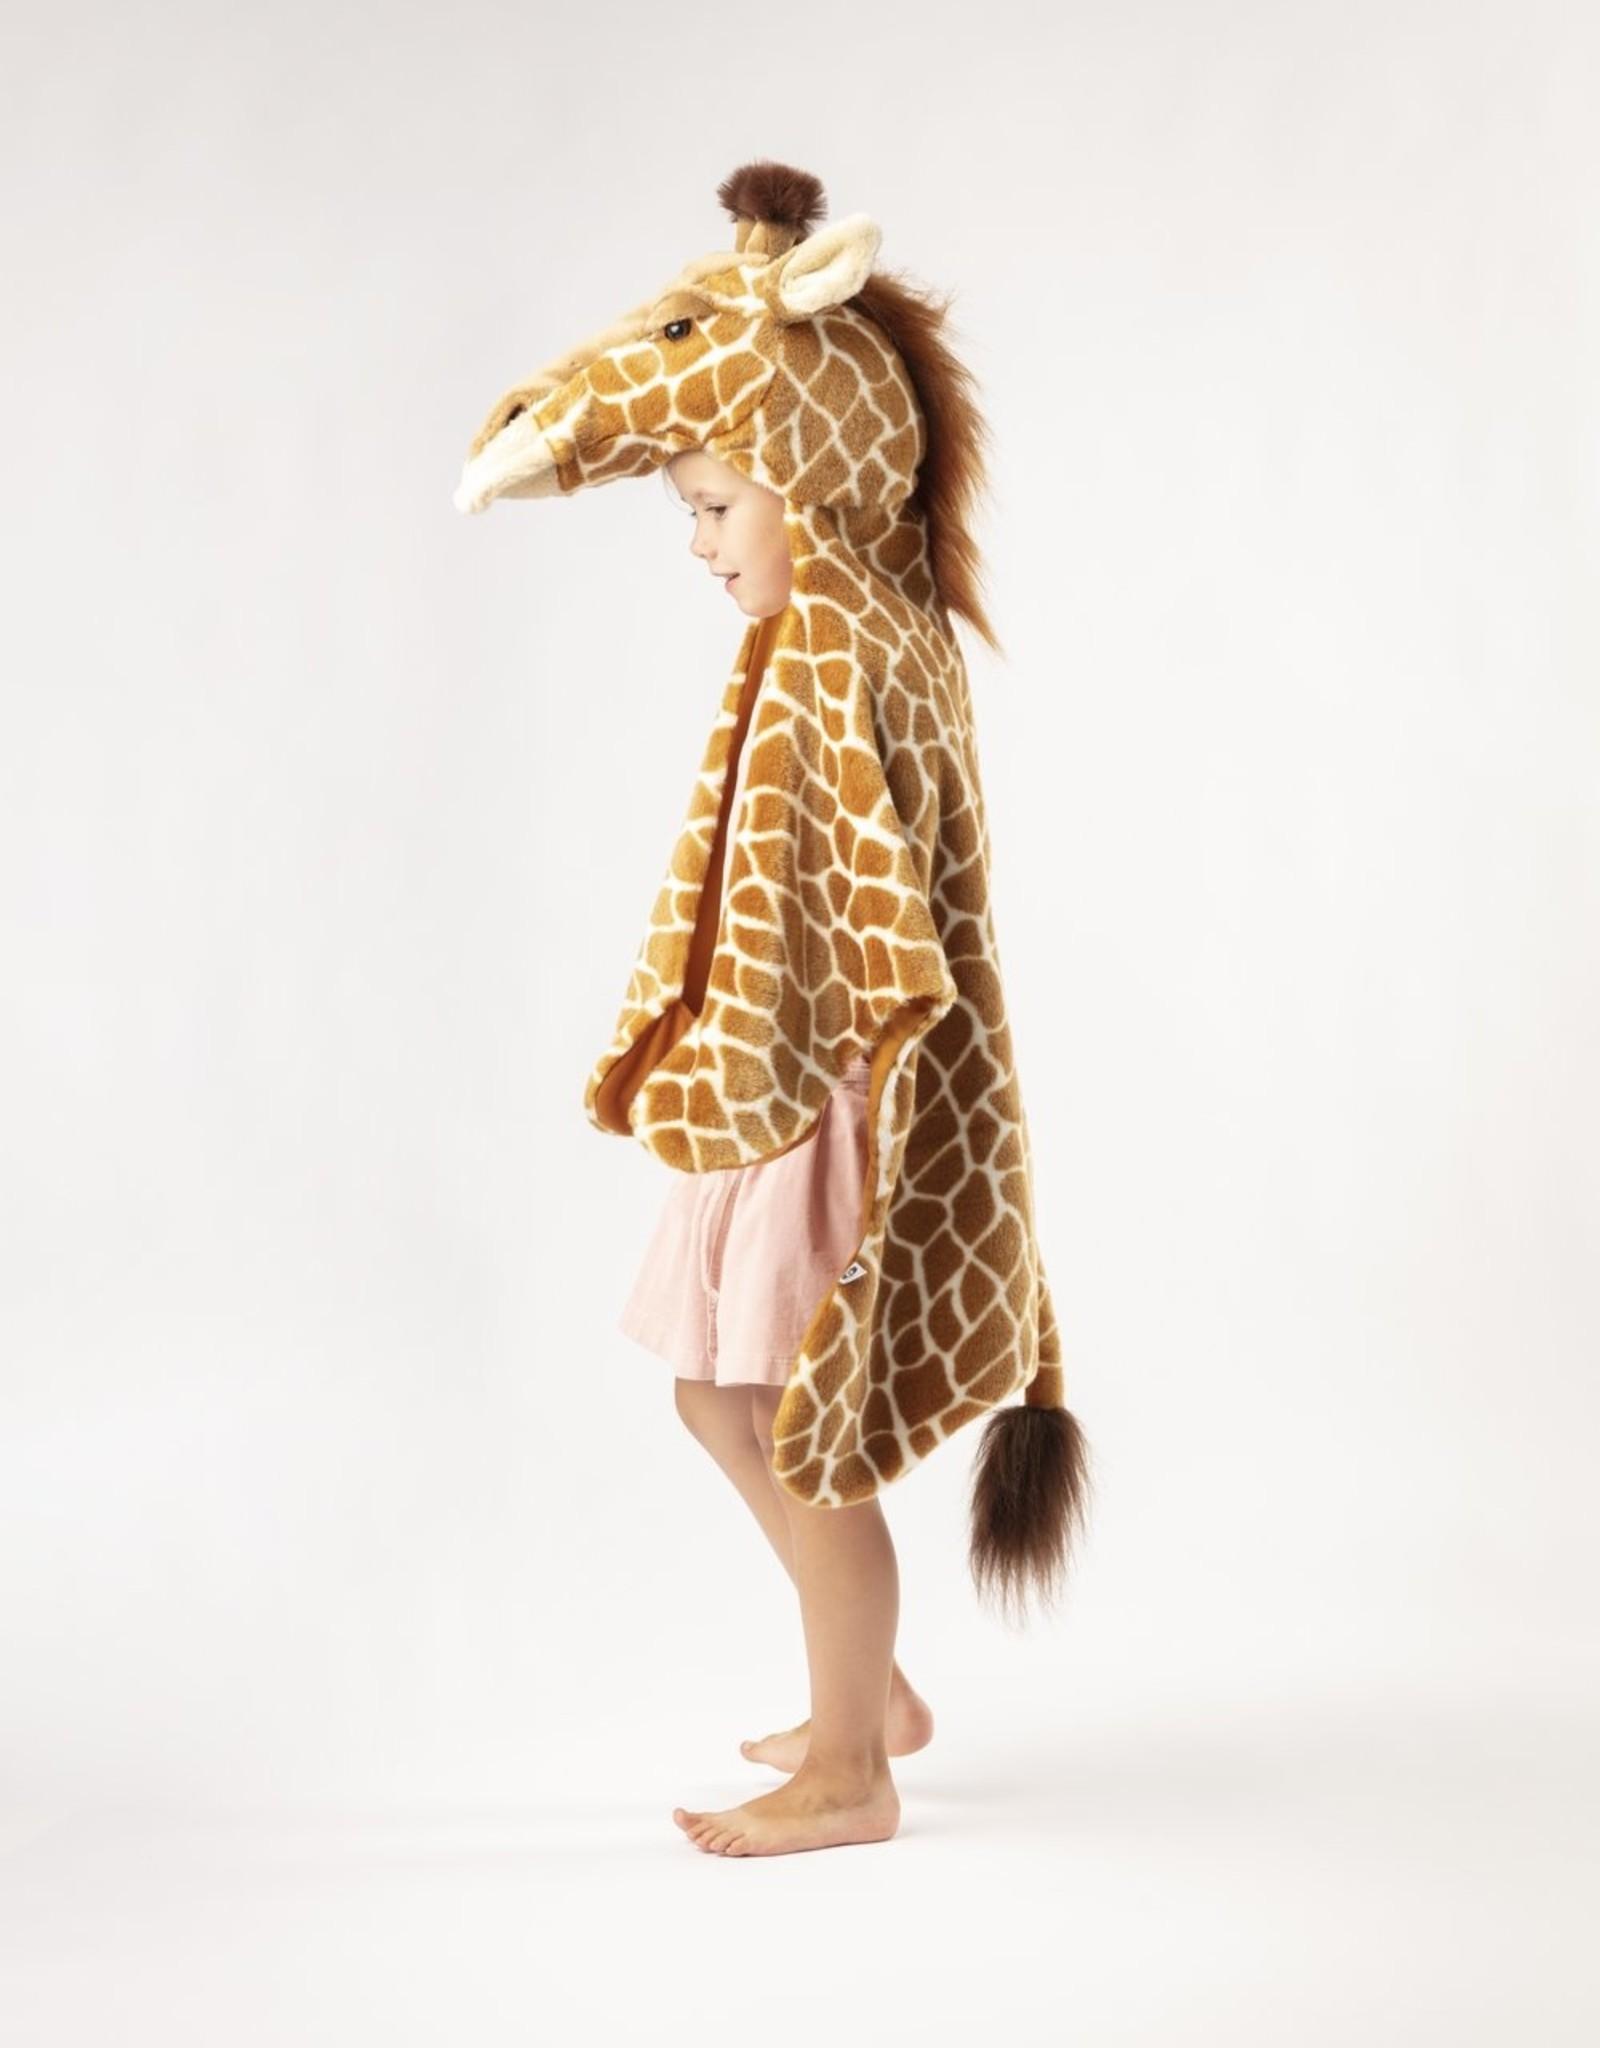 Wild and Soft Giraffe Disguise